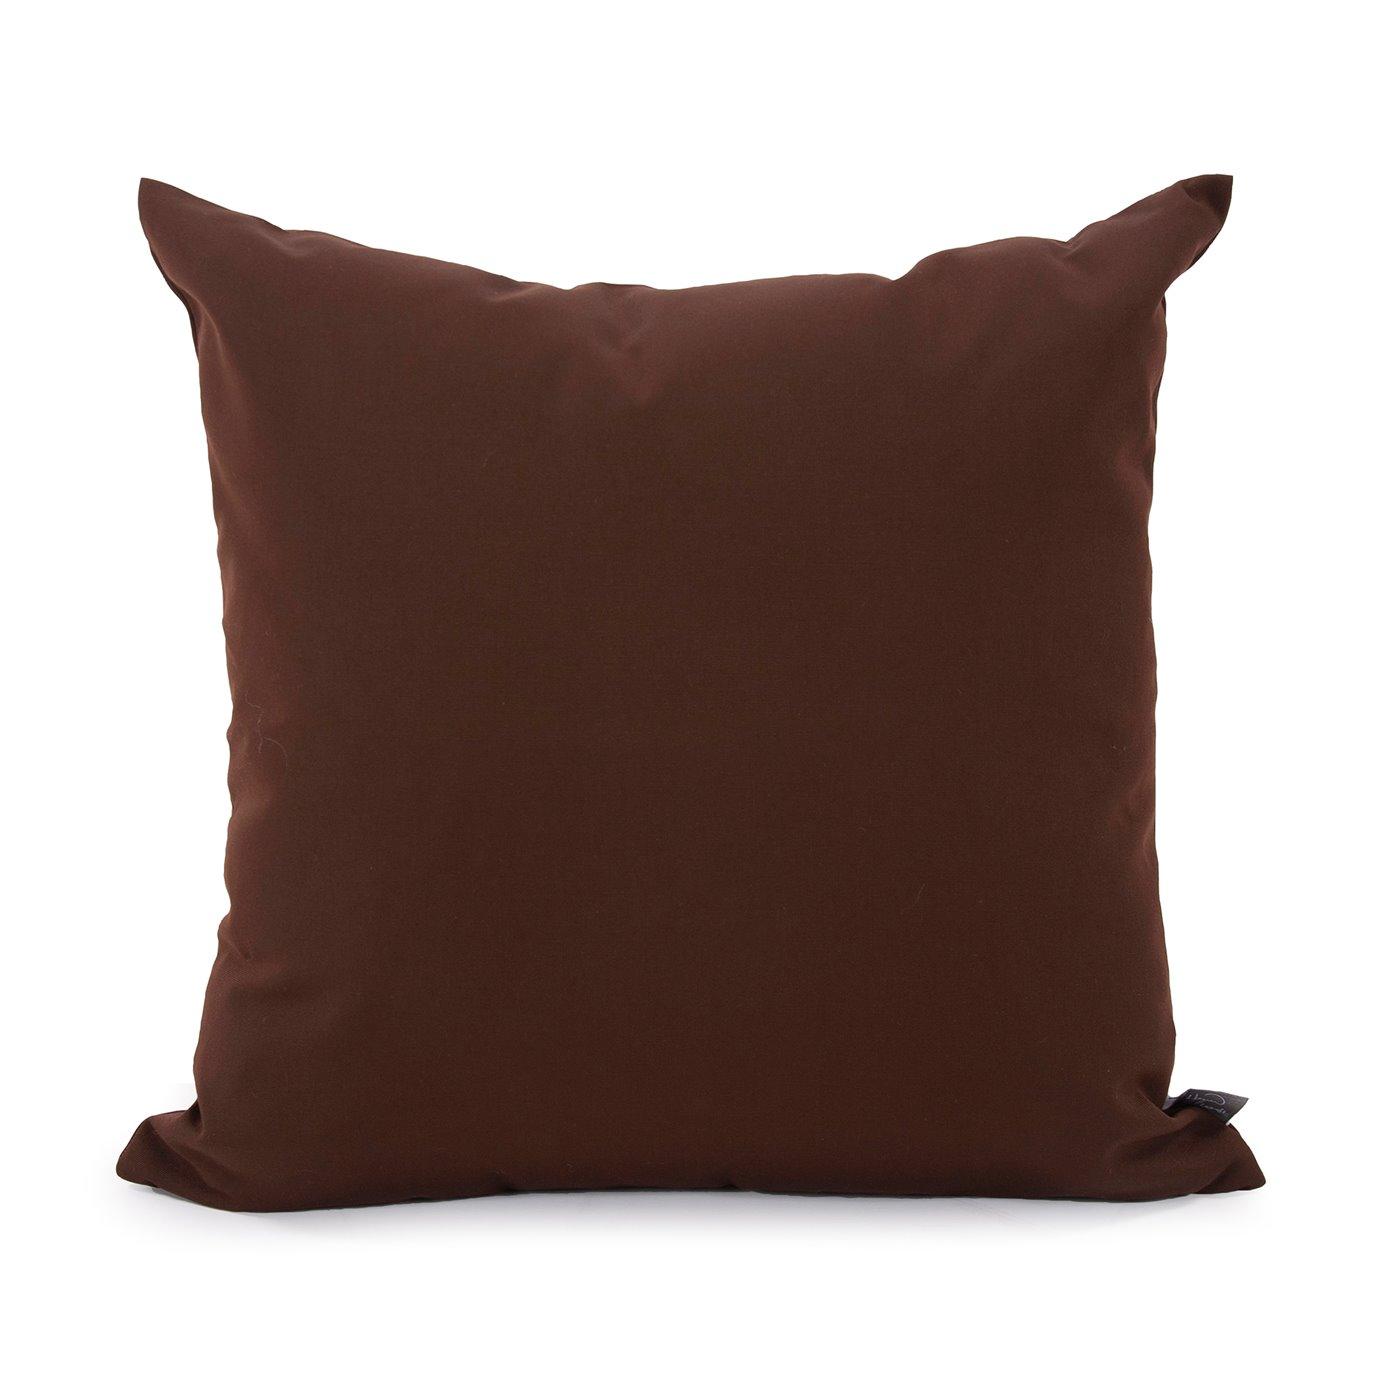 "Howard Elliott 20"" x 20"" Pillow Outdoor Sunbrella Seascape Chocolate"